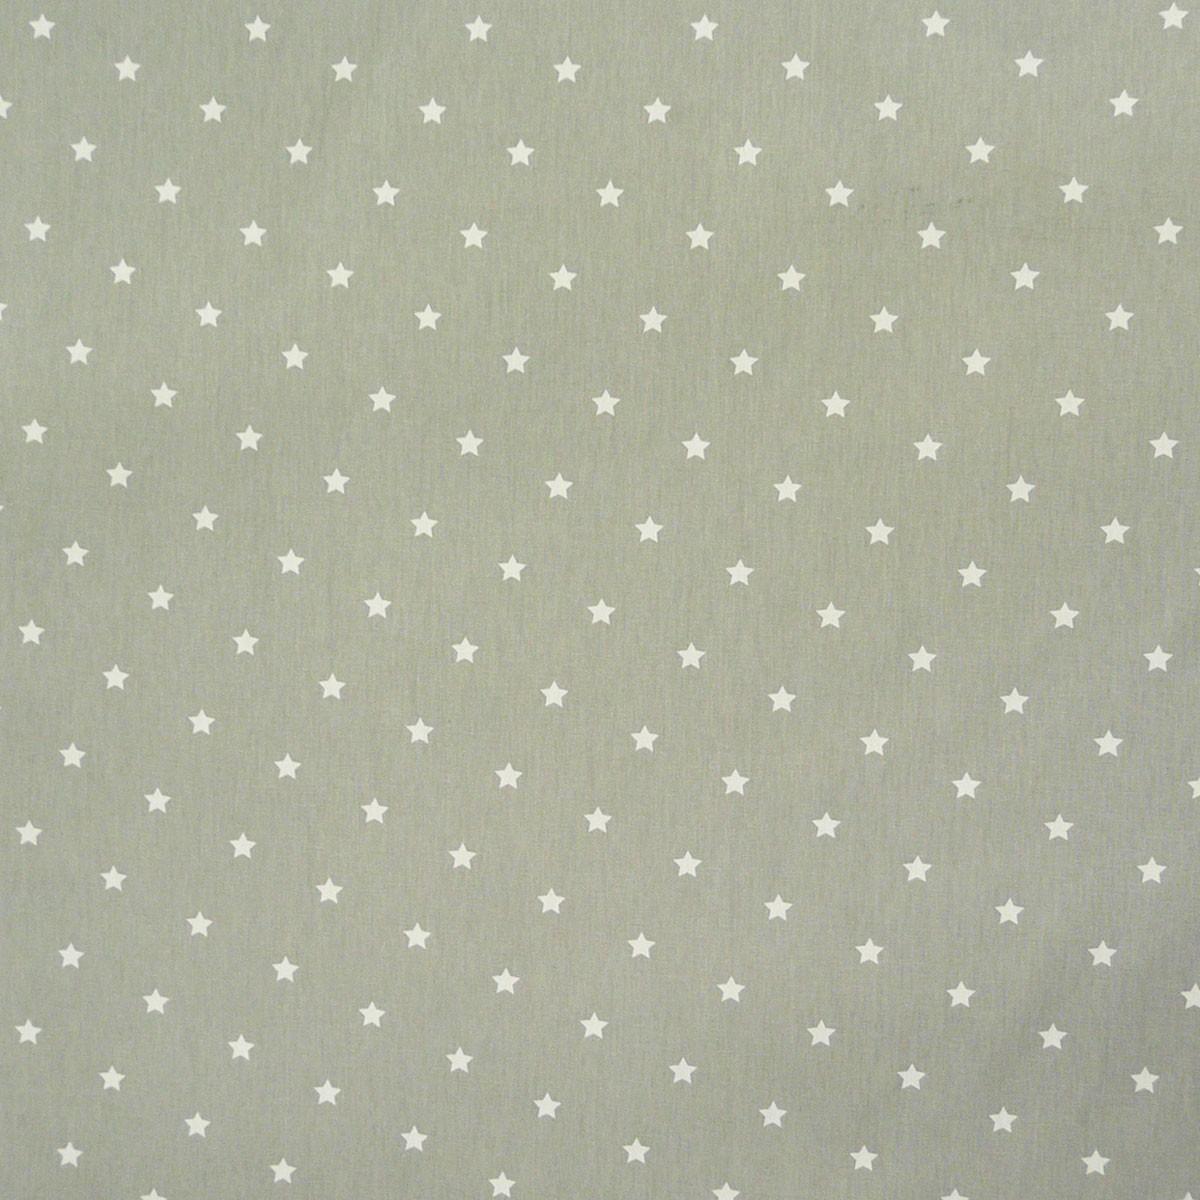 Baumwollstoff Twinkle Sterne grau weiß Stoff Gardinenstoff Dekostoff